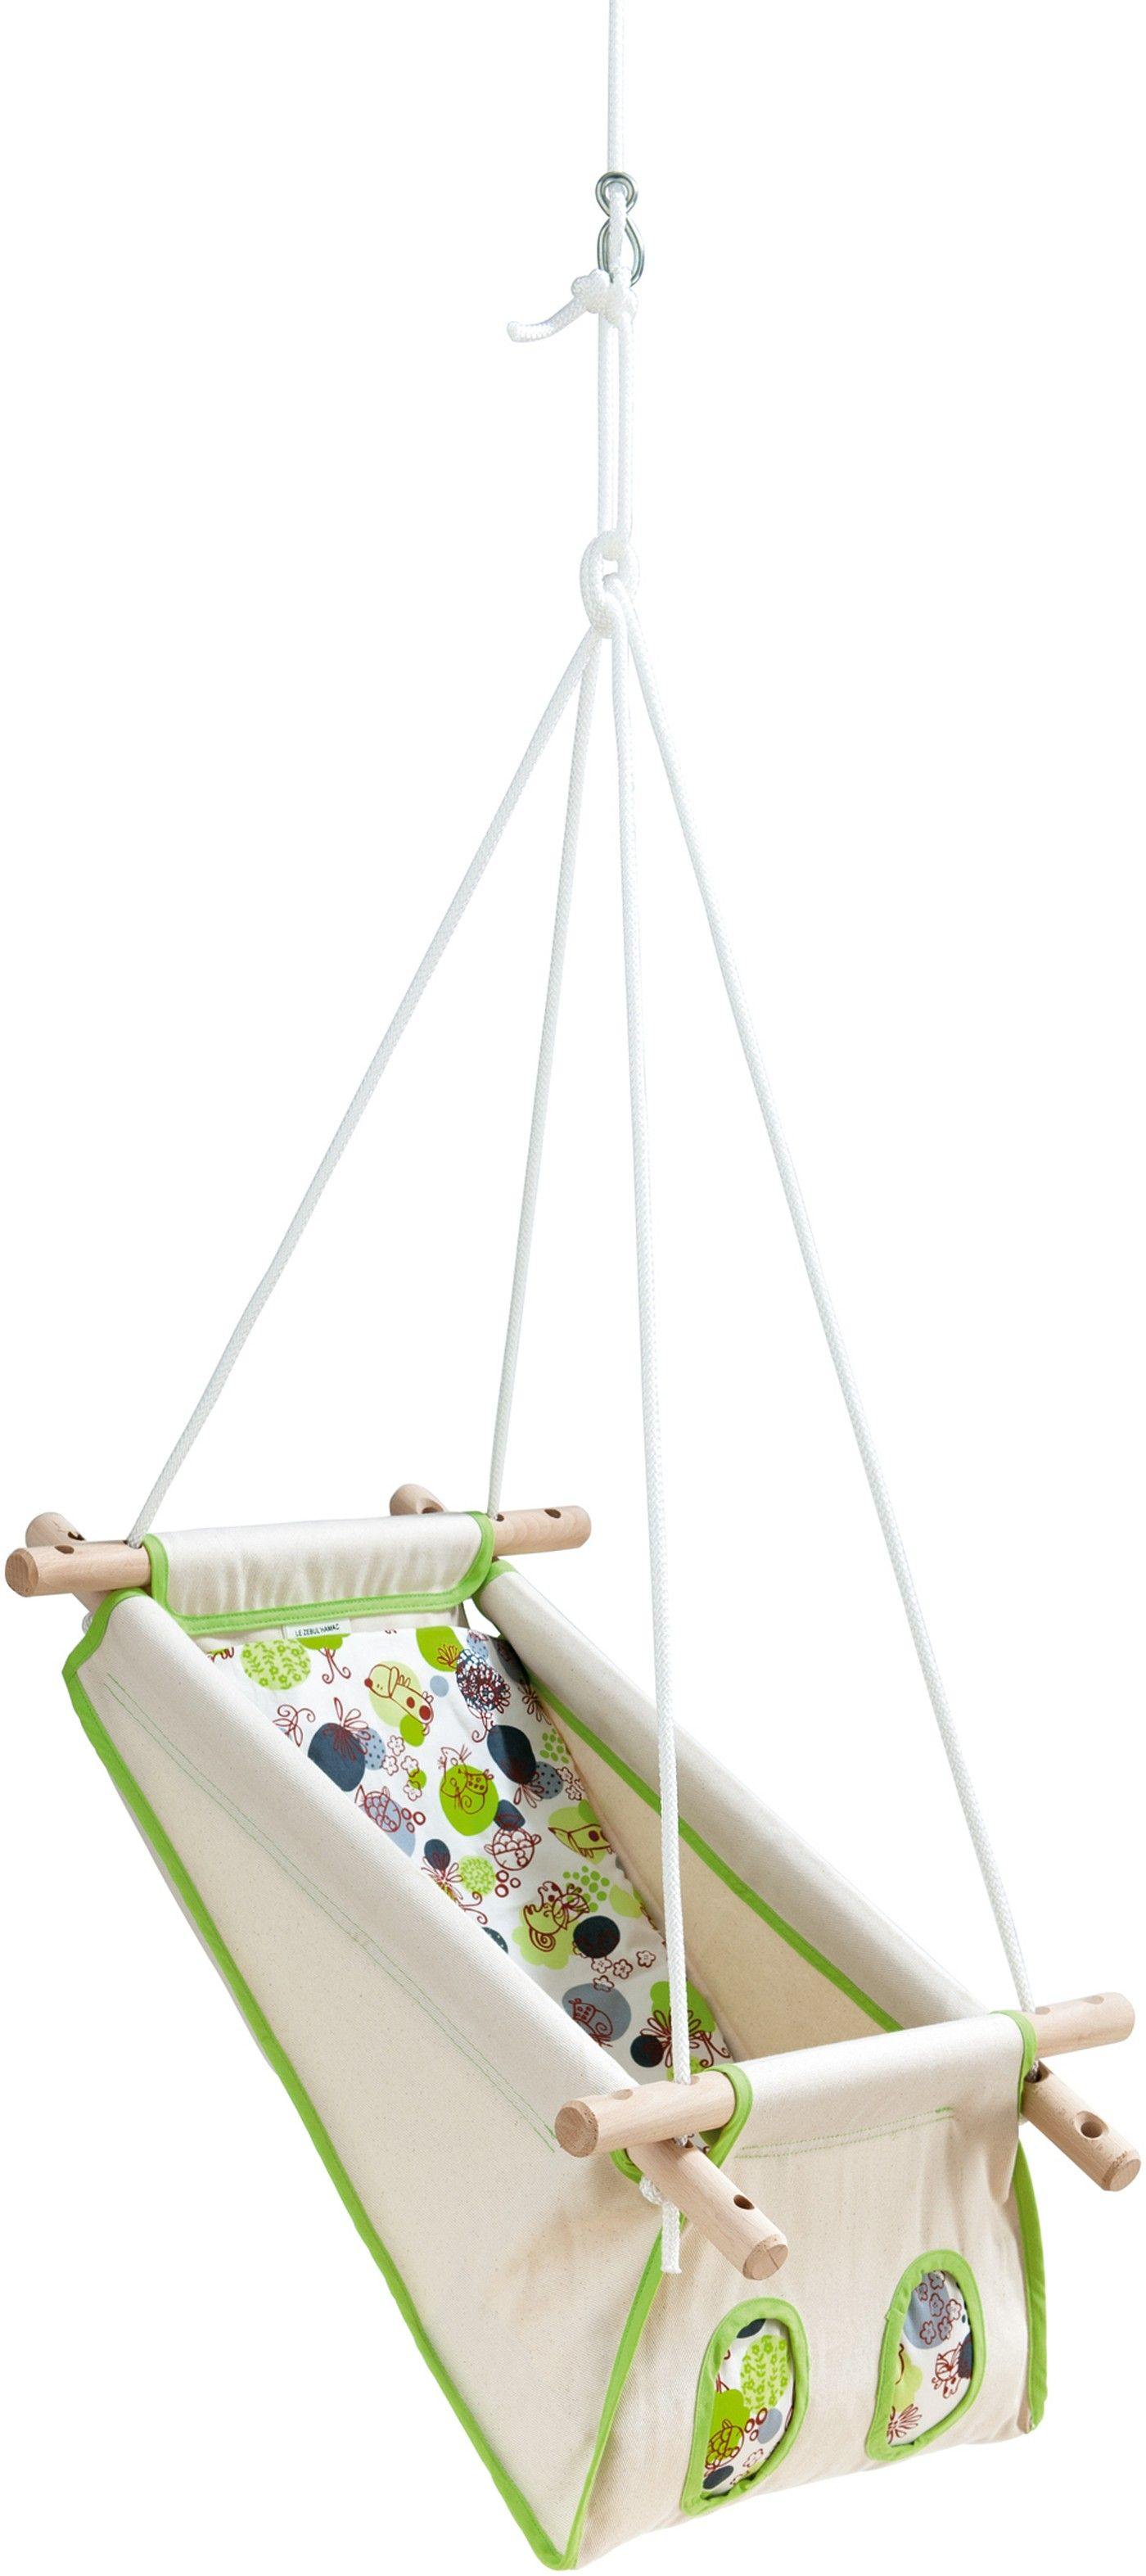 Baby hammock Детки шитье pinterest baby hammock babies and